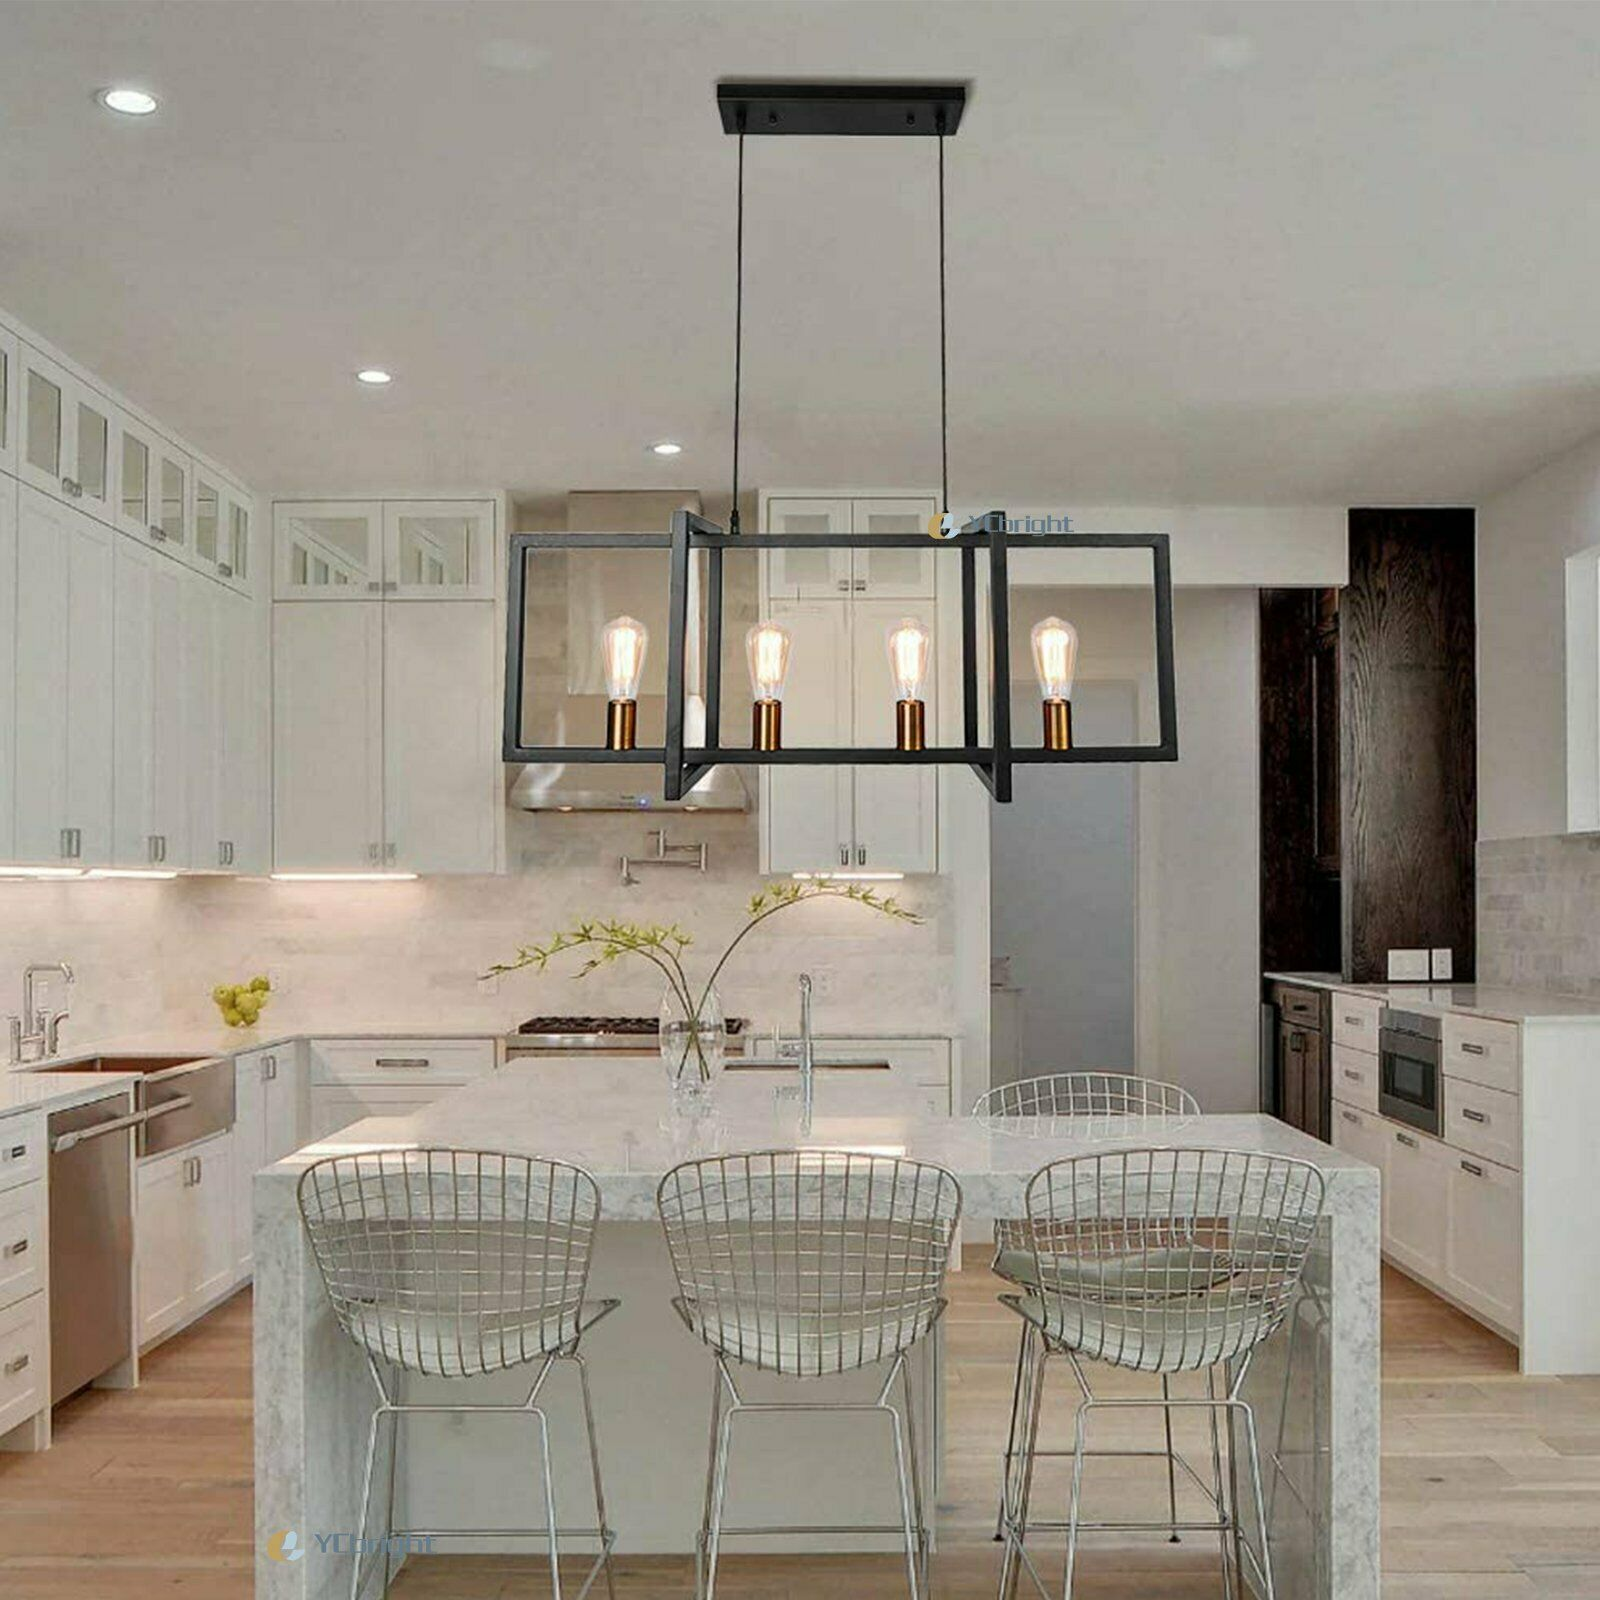 Playful Hanging Lamp Light Pendant Luminaire Dining Room Lights For Sale Online Ebay